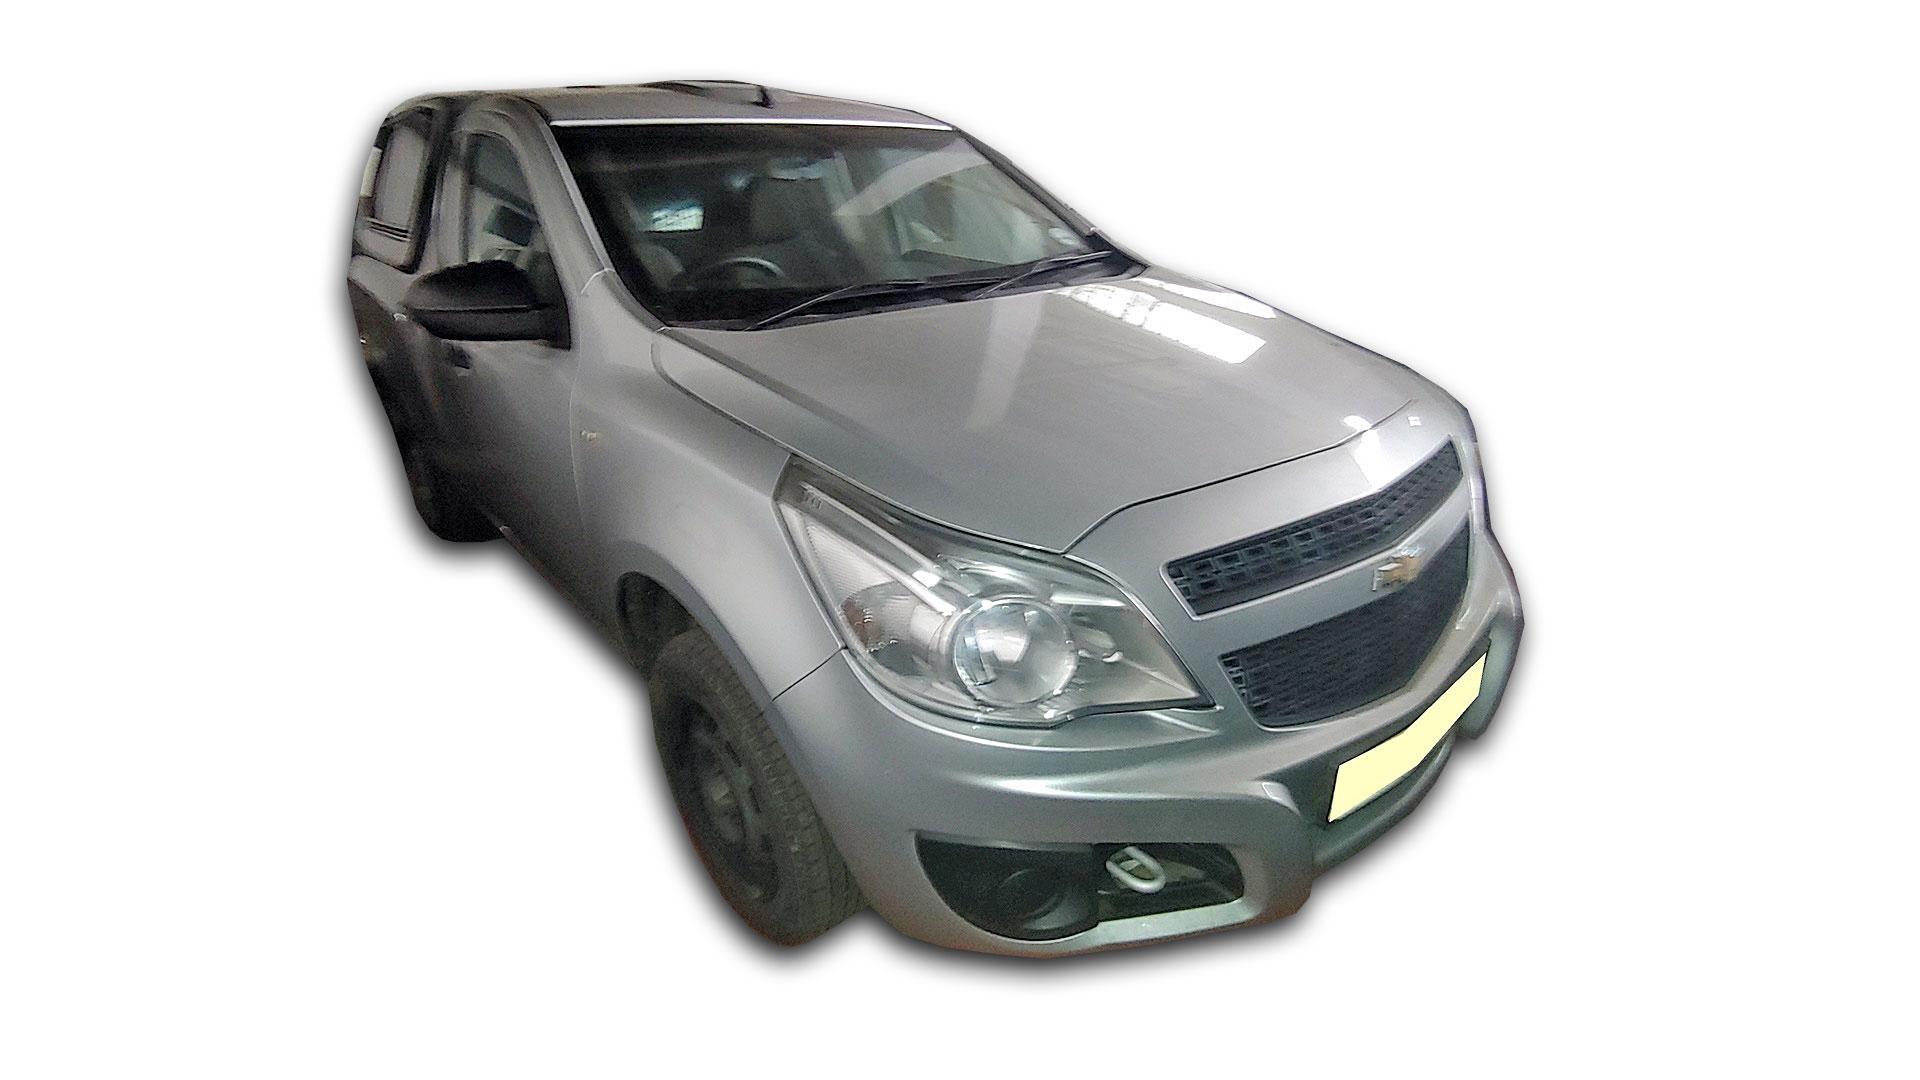 Chevrolet Utility 1.4 S/C P/U